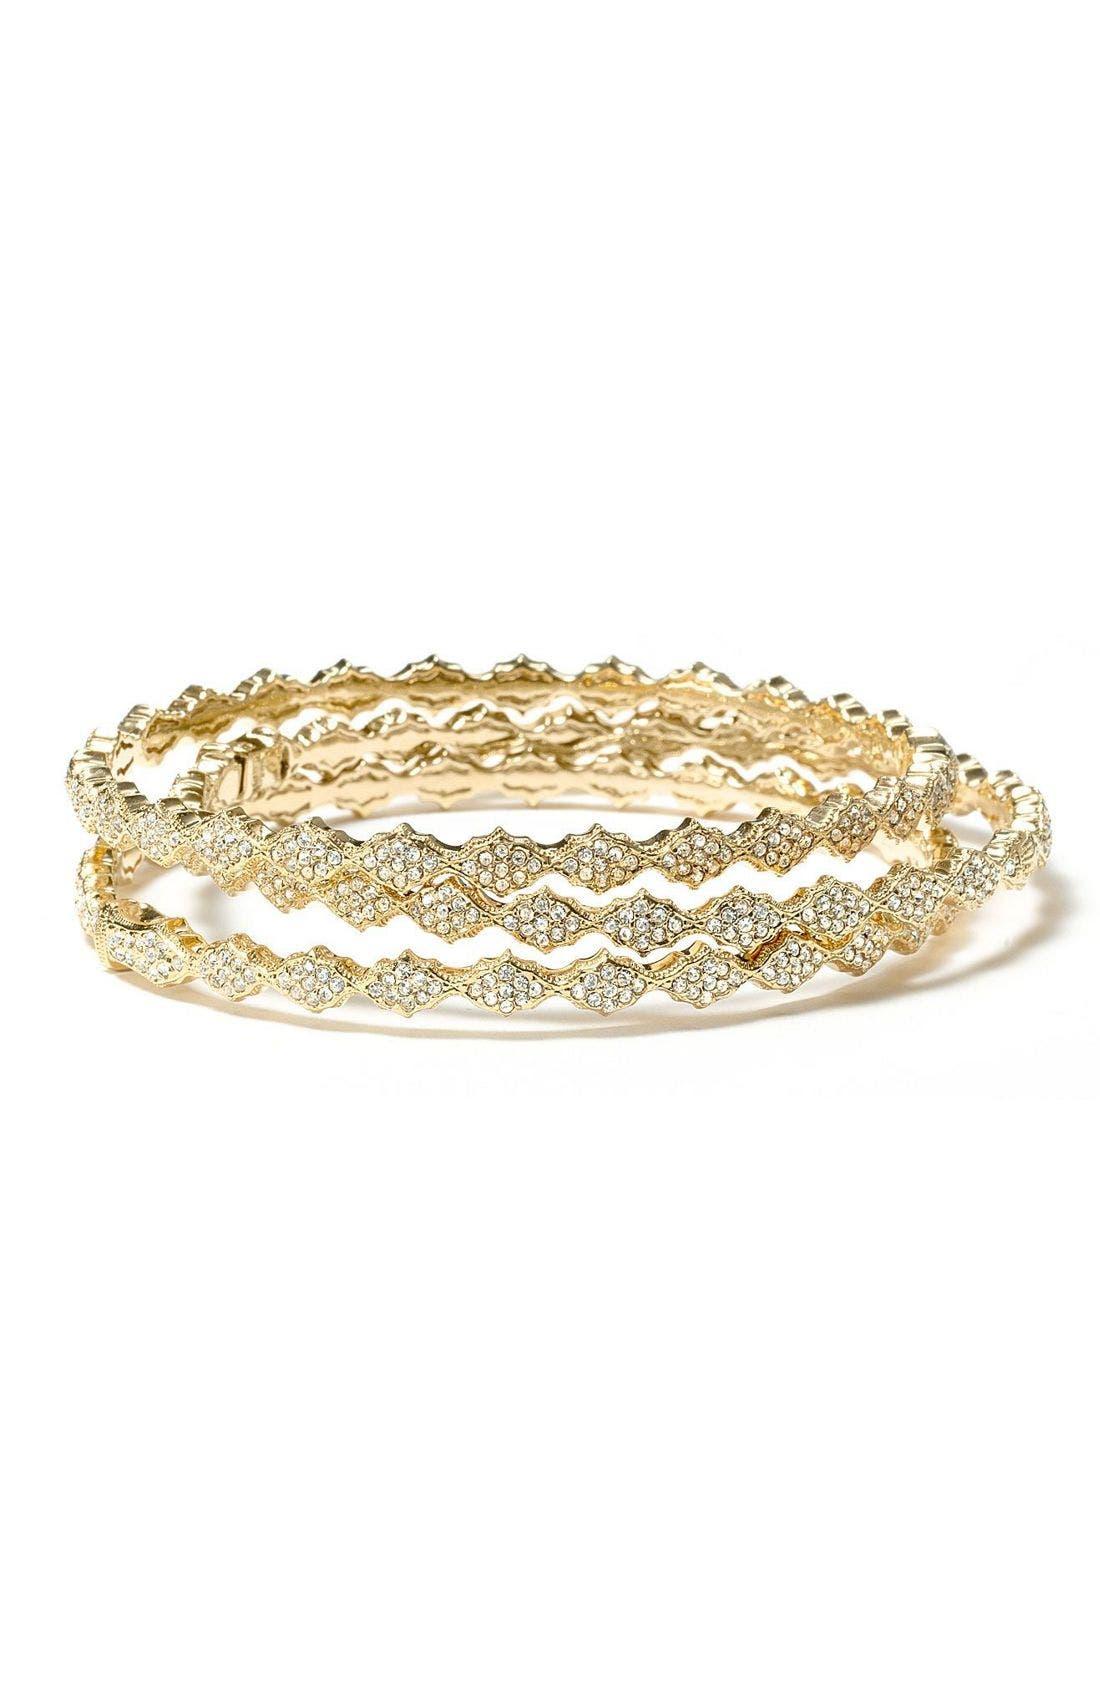 Alternate Image 1 Selected - Nadri Crystal Filigree Bangle Bracelet